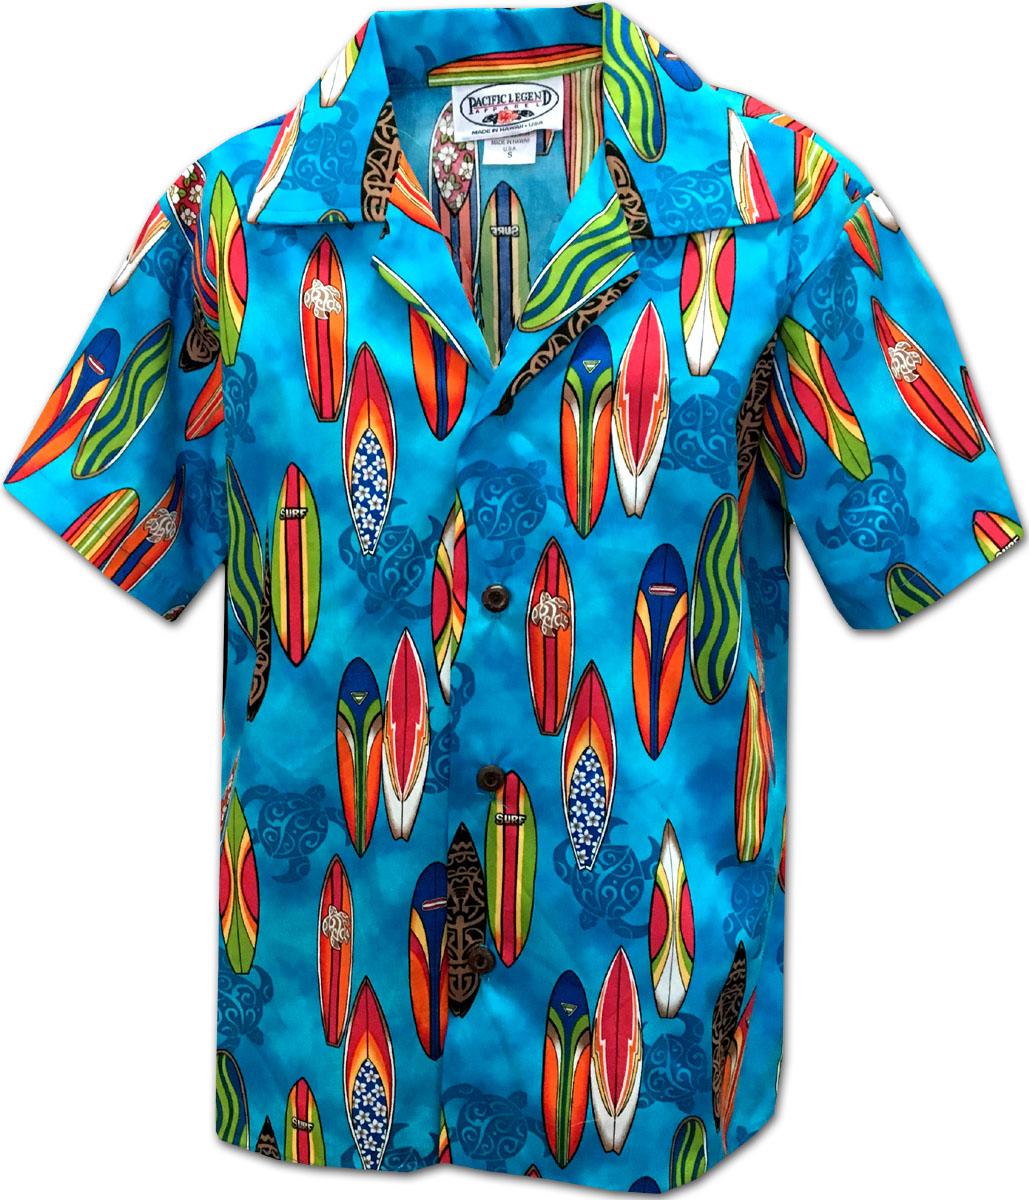 ed6ff291 211-3860 BLUE Pacific Legend Boys Shirt